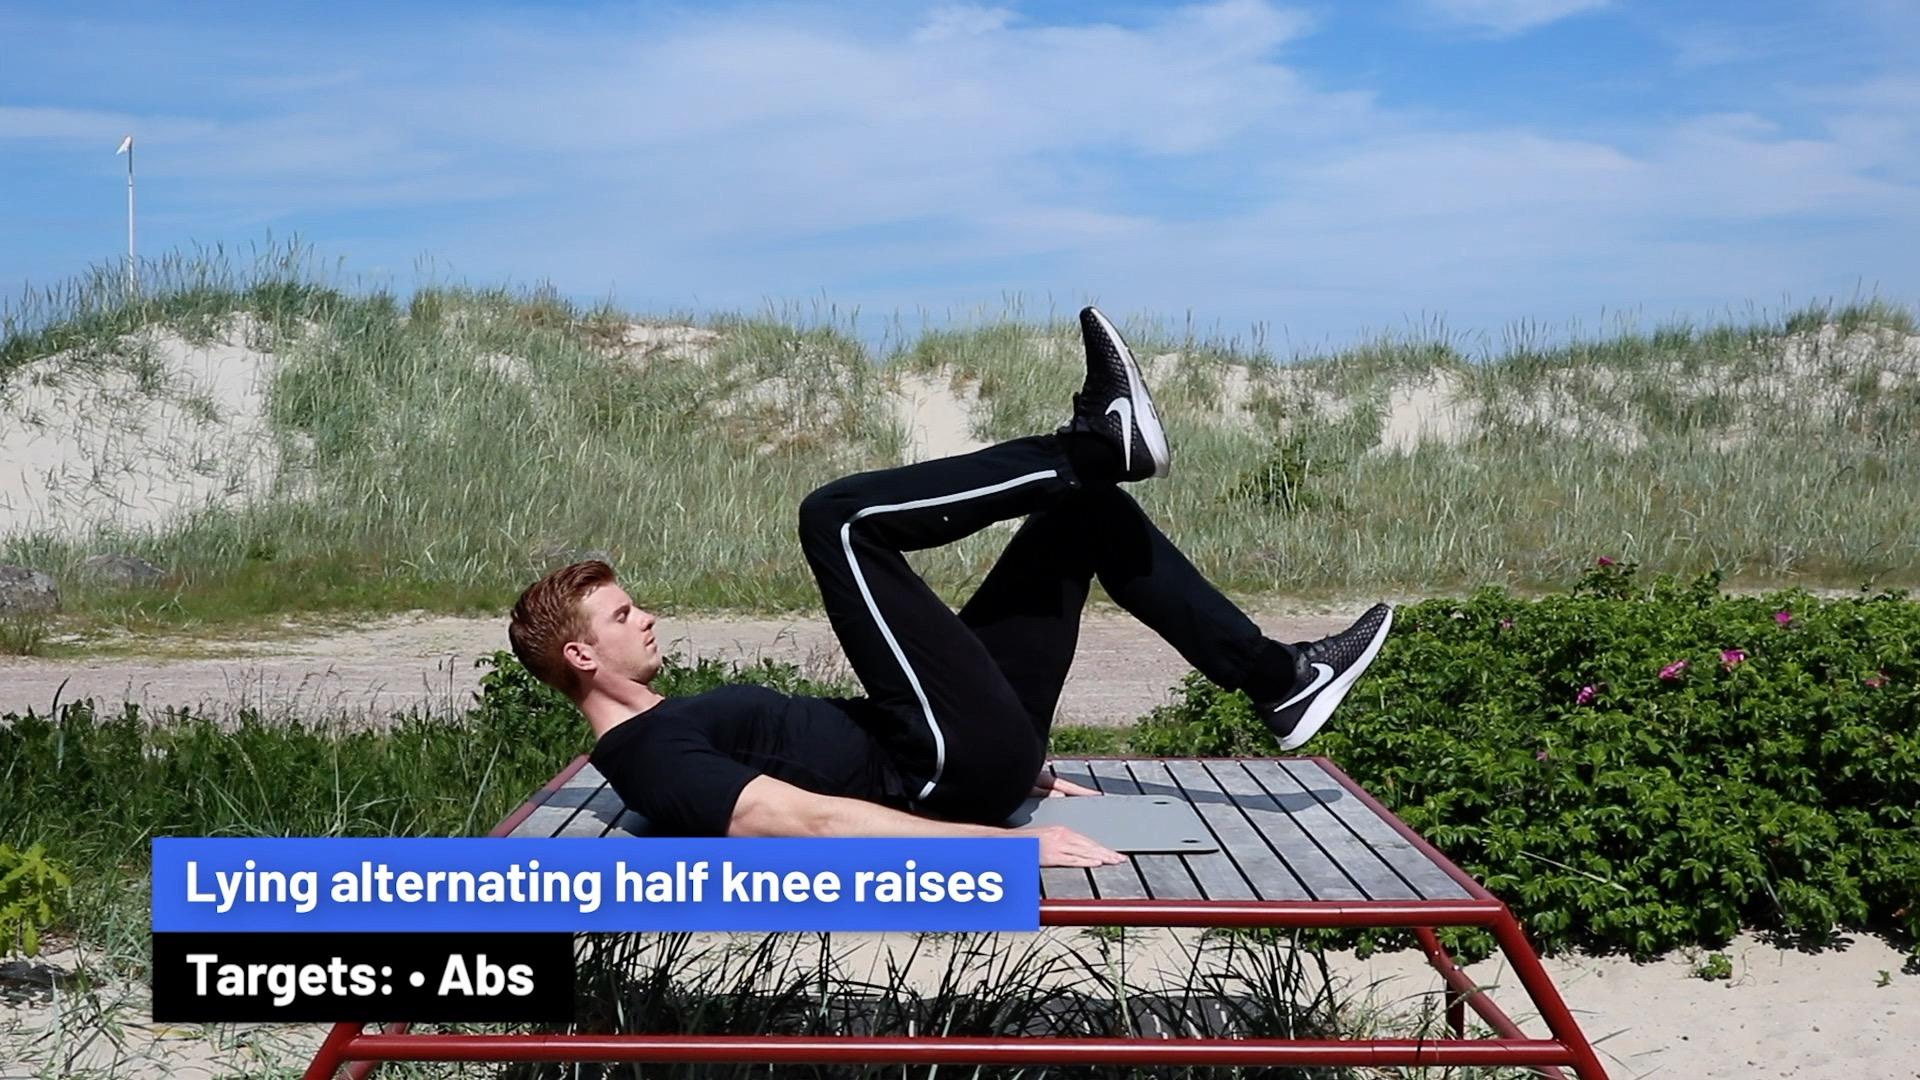 Lying alternating half knee raises